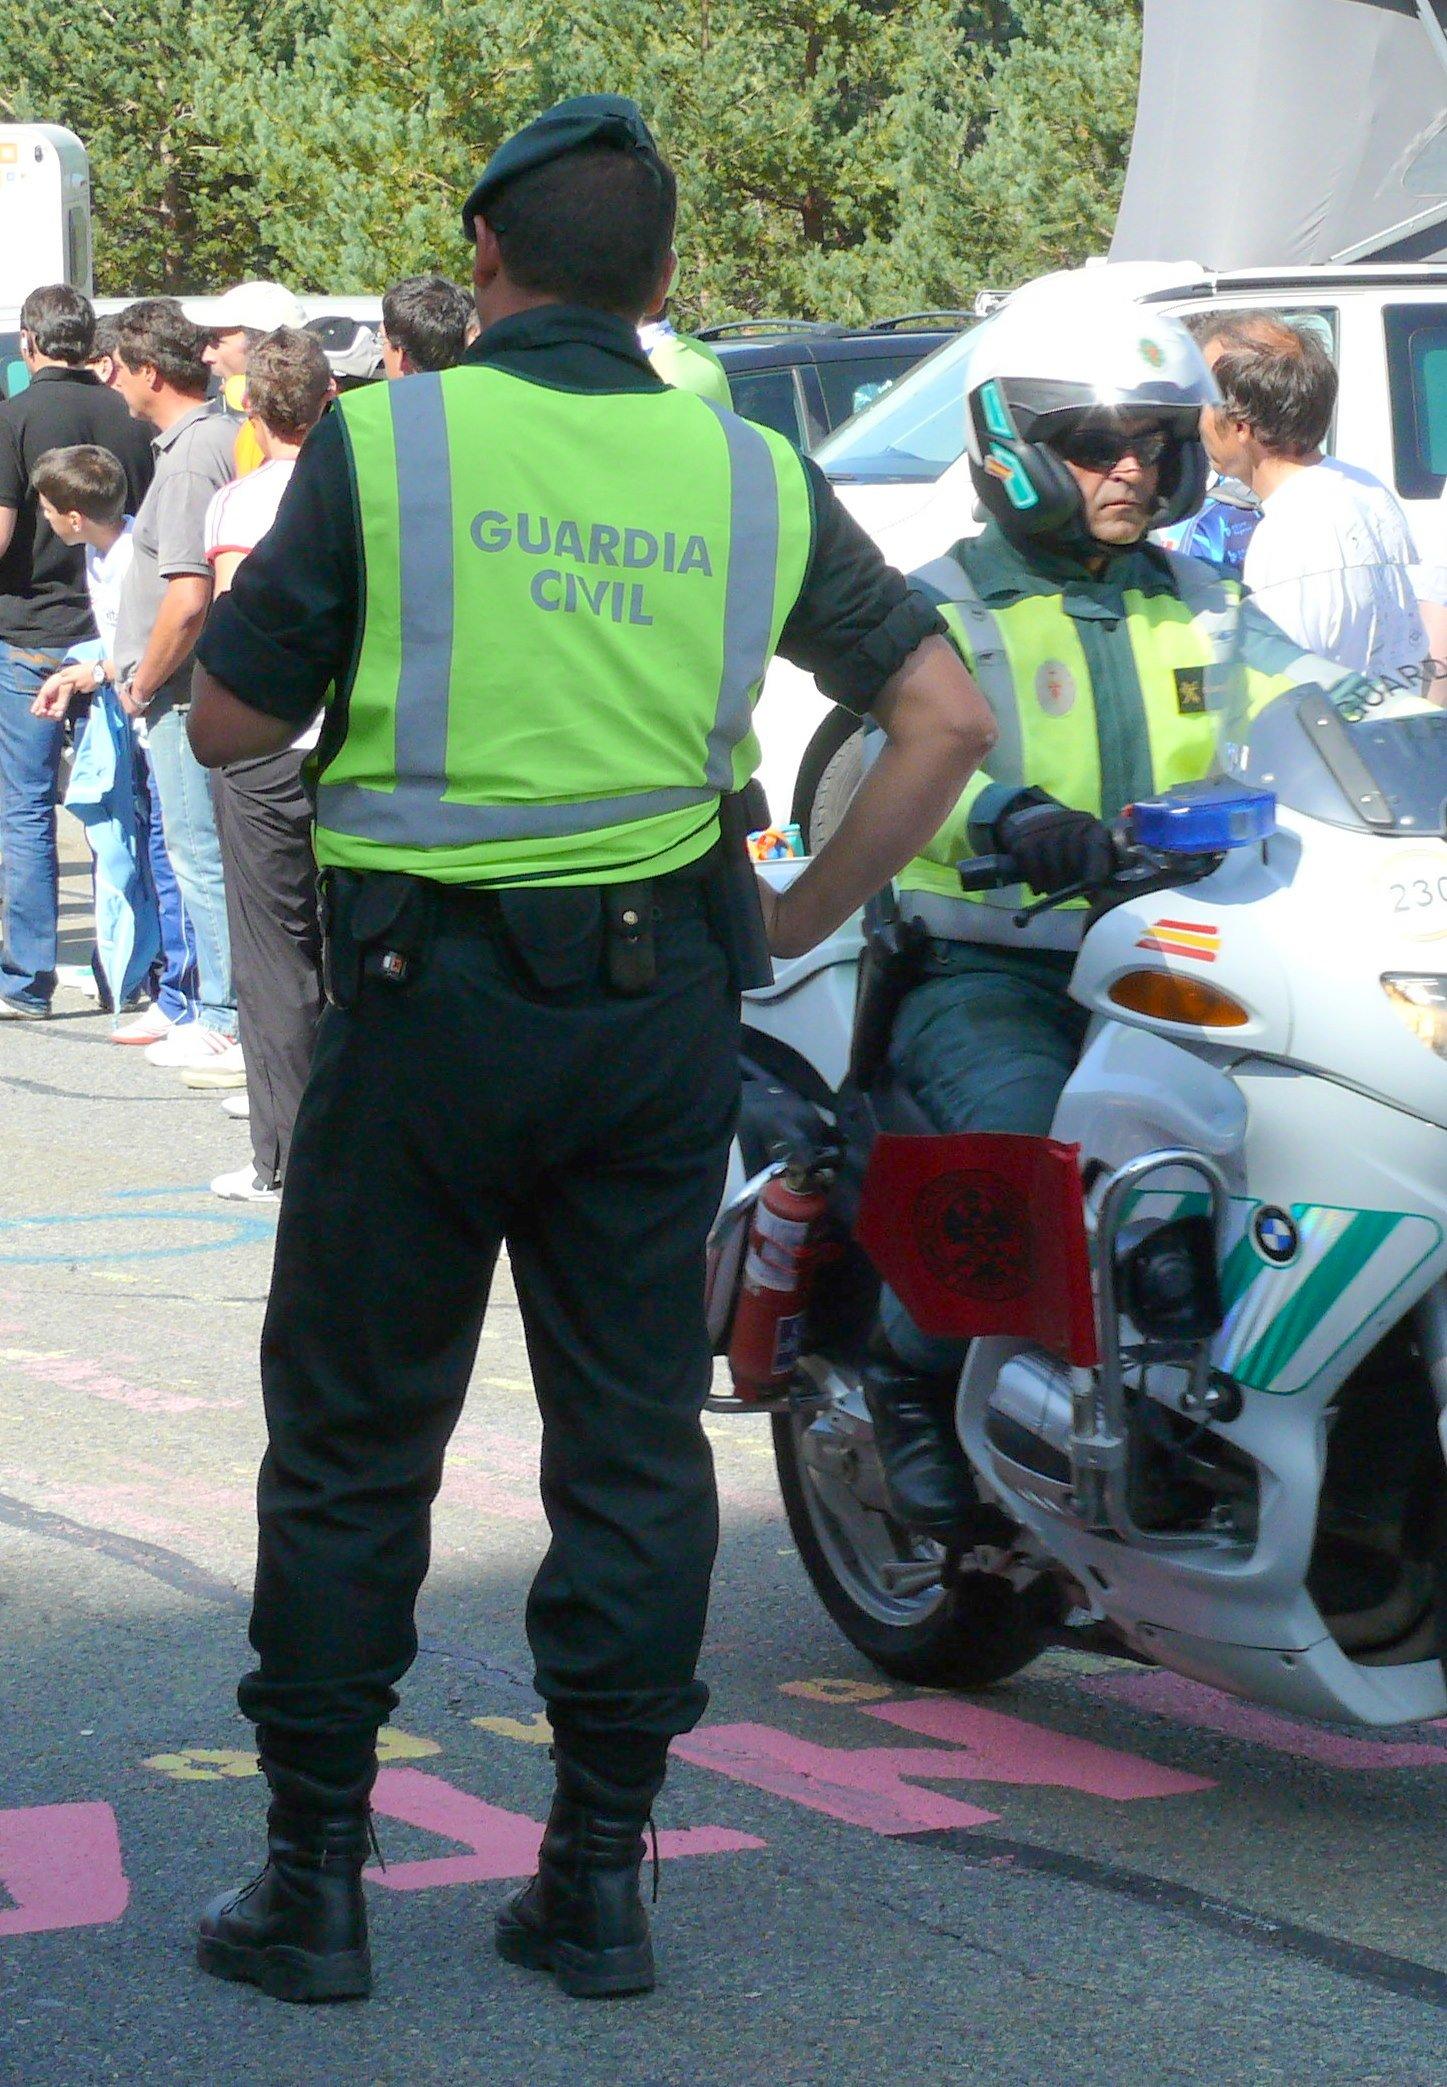 Oficiales de la Guardia Civil. | Imagen: Flickr